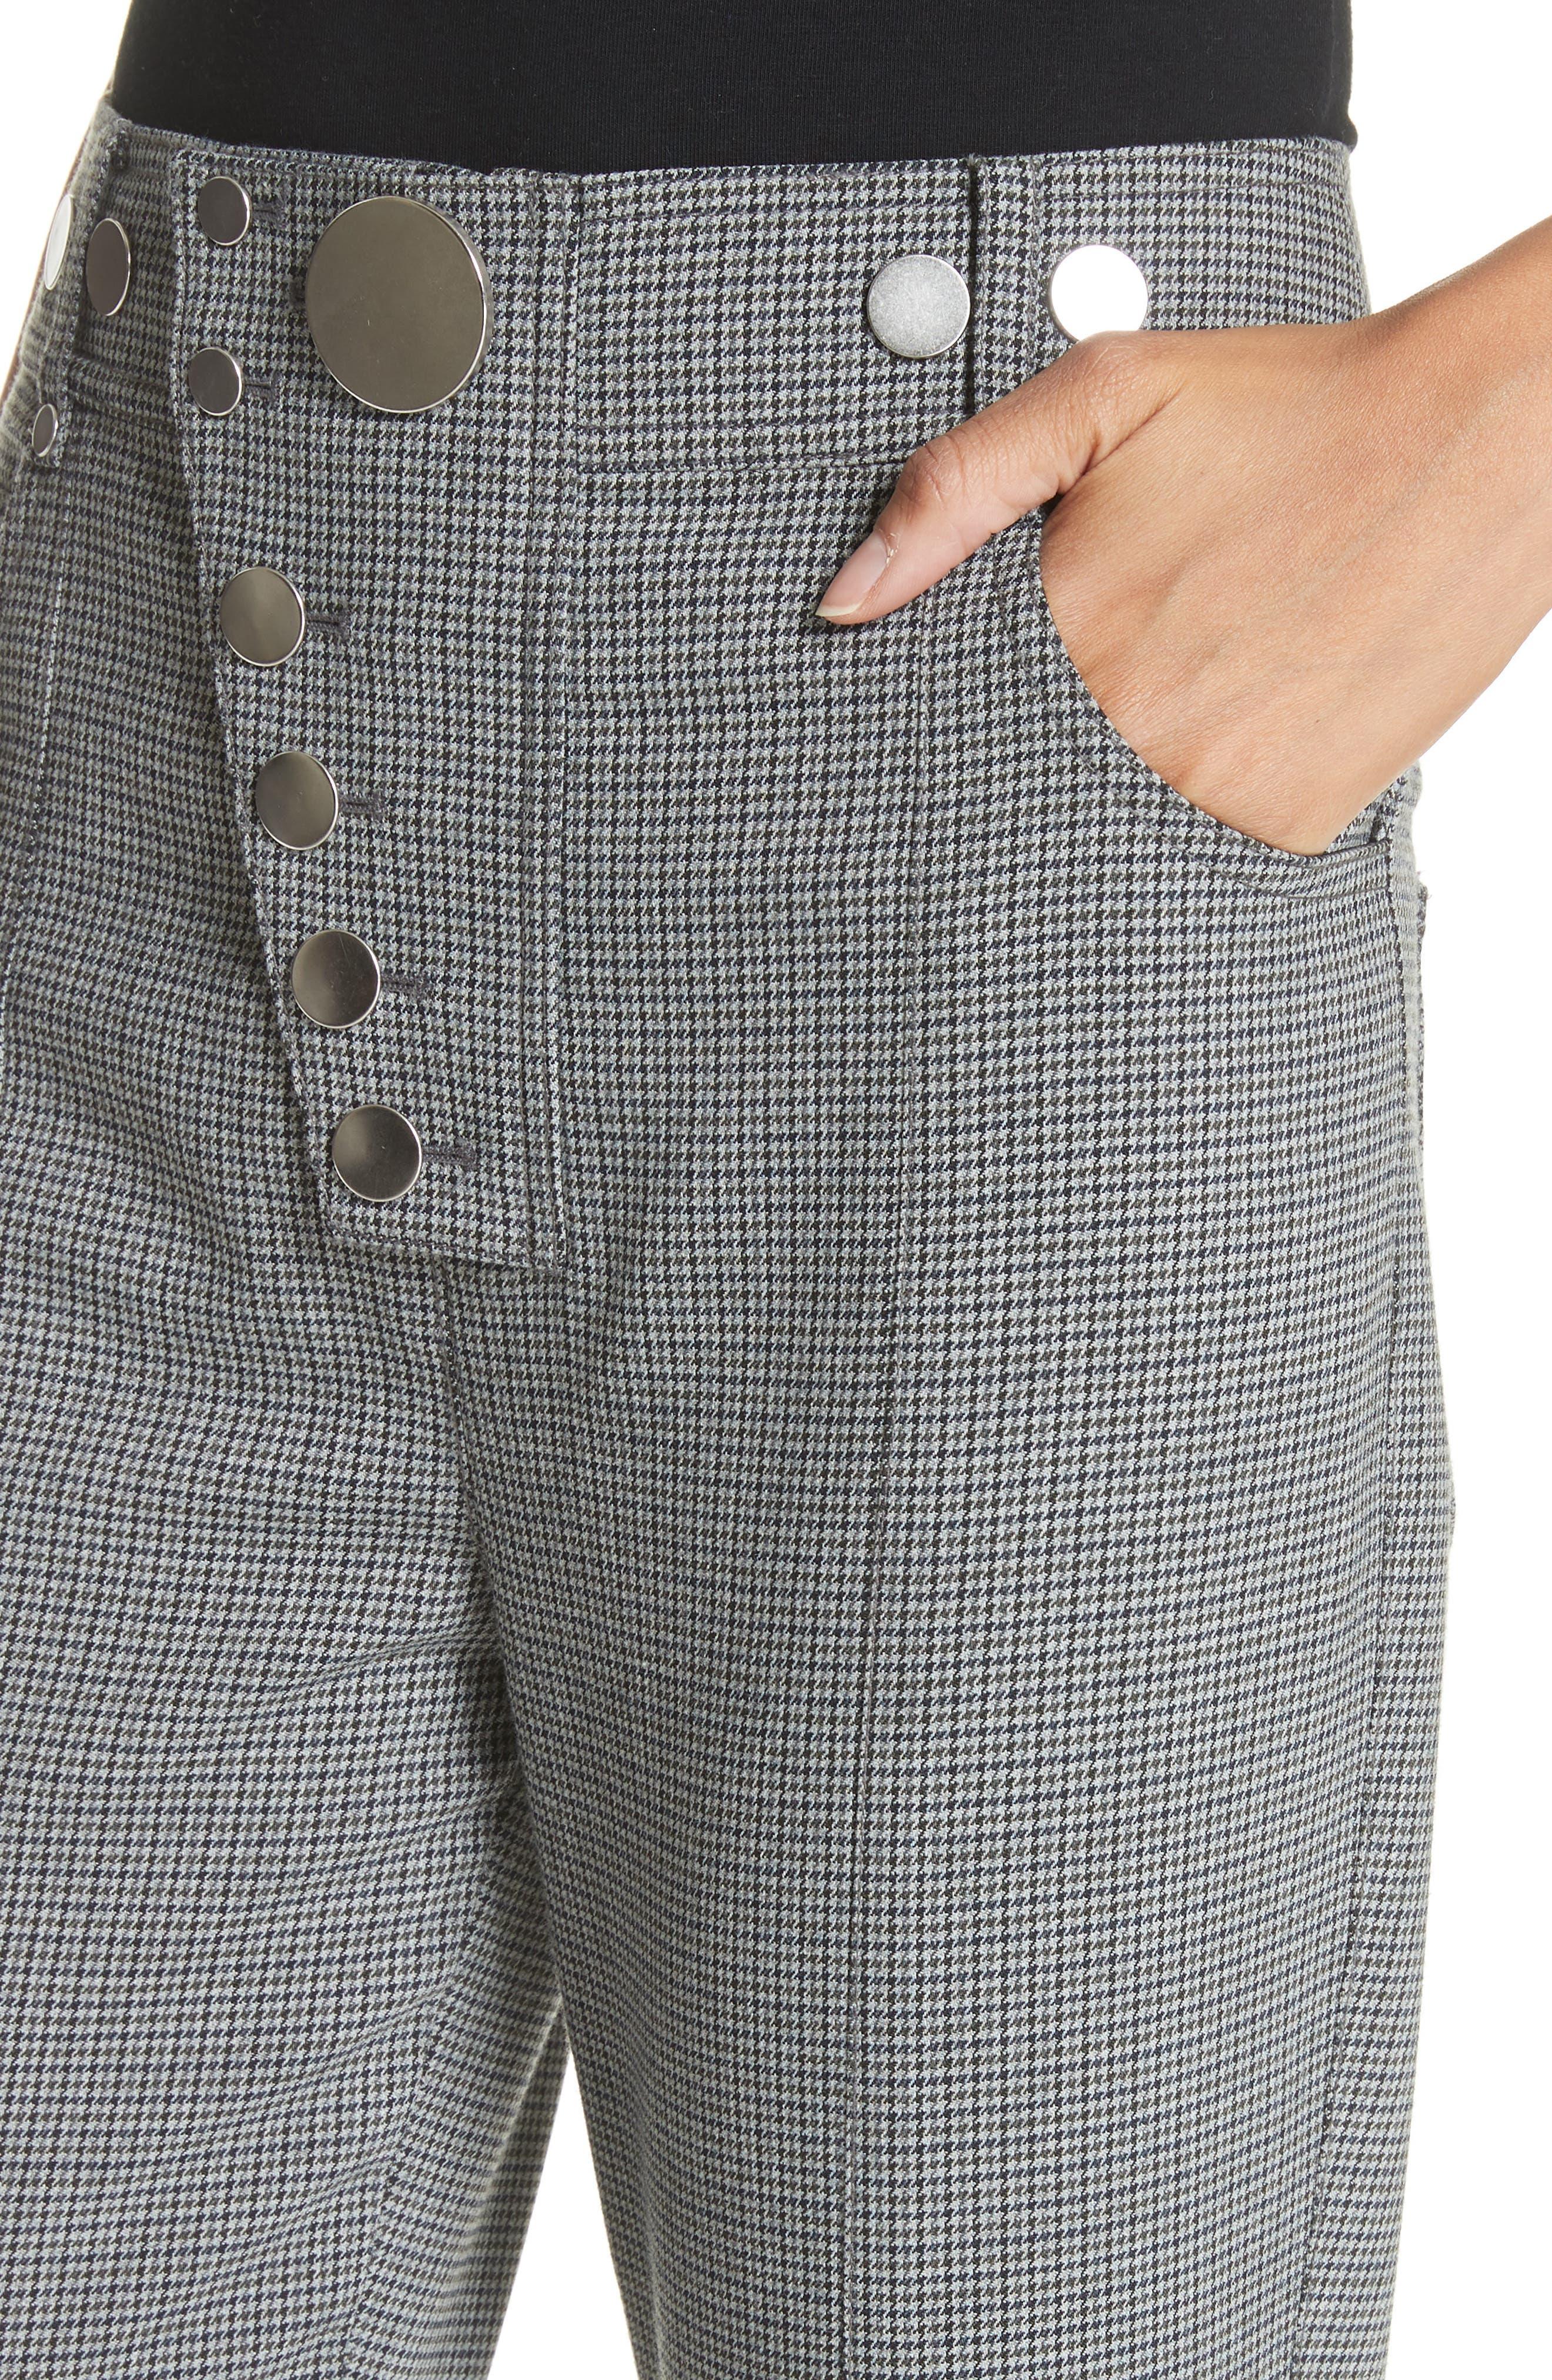 ALEXANDER WANG,                             Skinny Plaid Pants,                             Alternate thumbnail 4, color,                             020